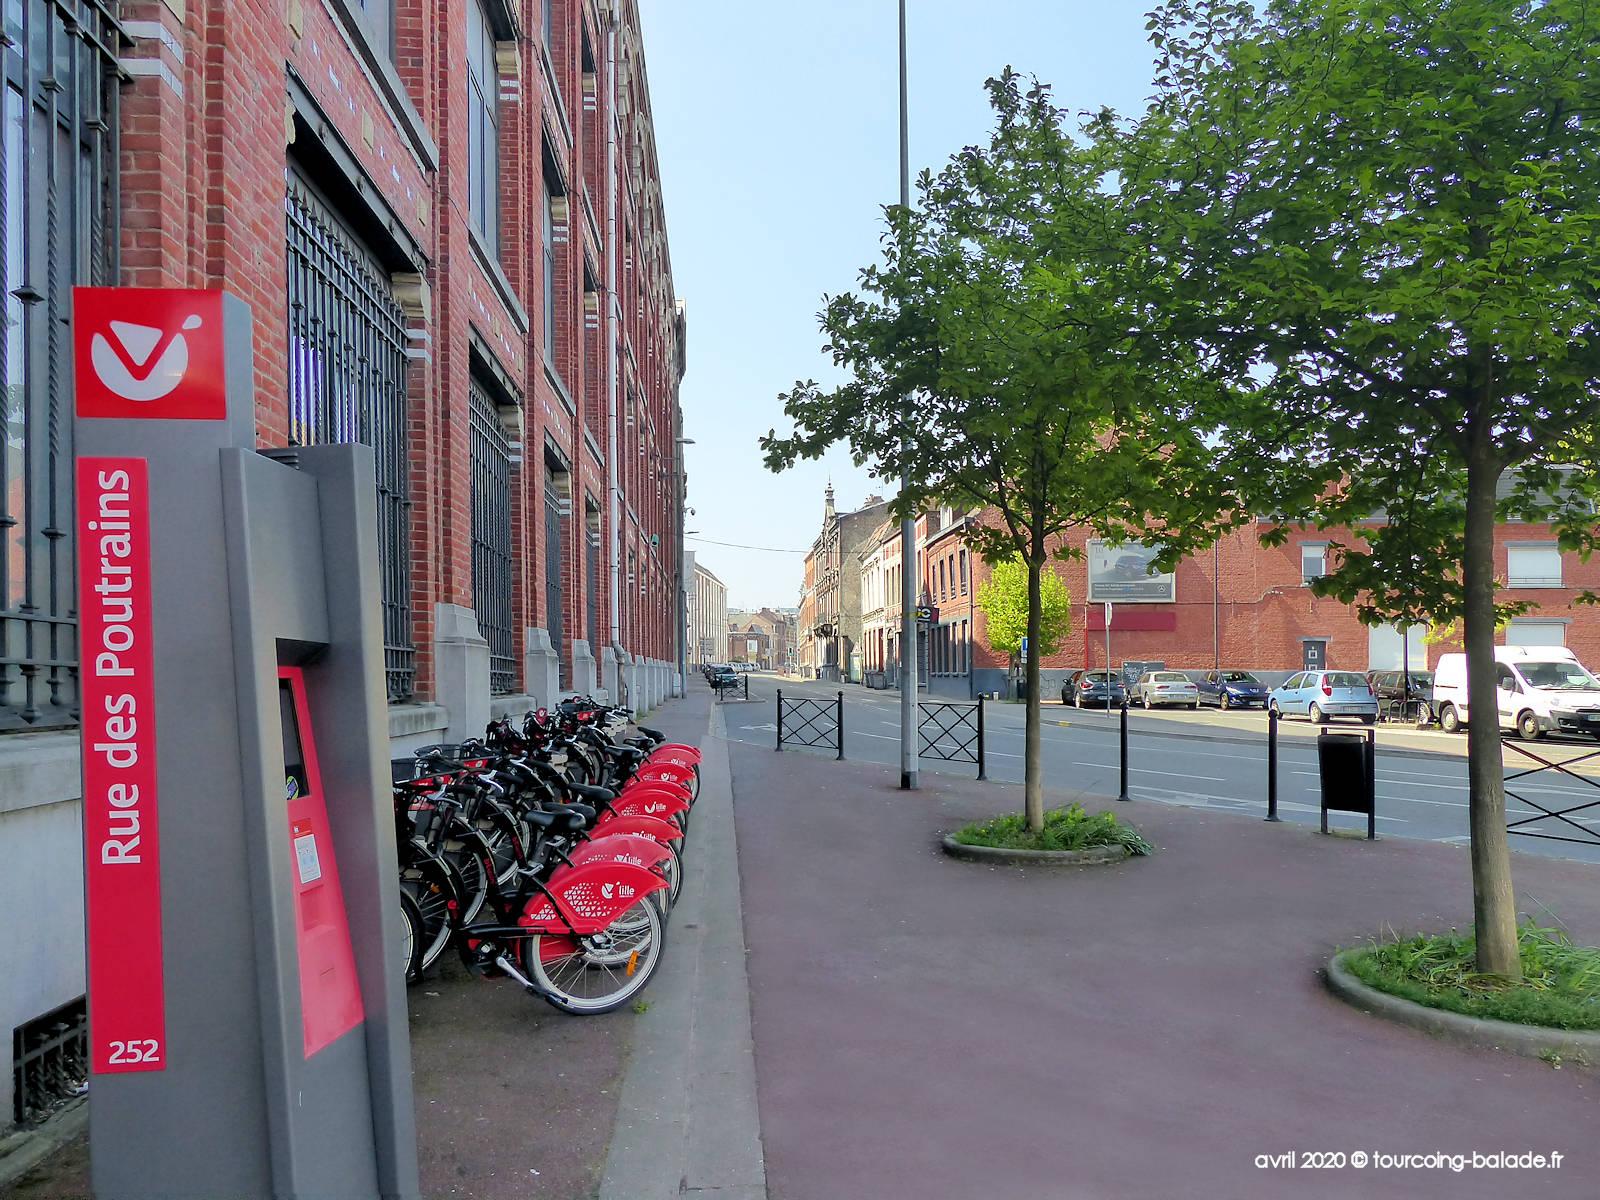 Station V'Lille Rue des Poutrains, Tourcoing - 2020